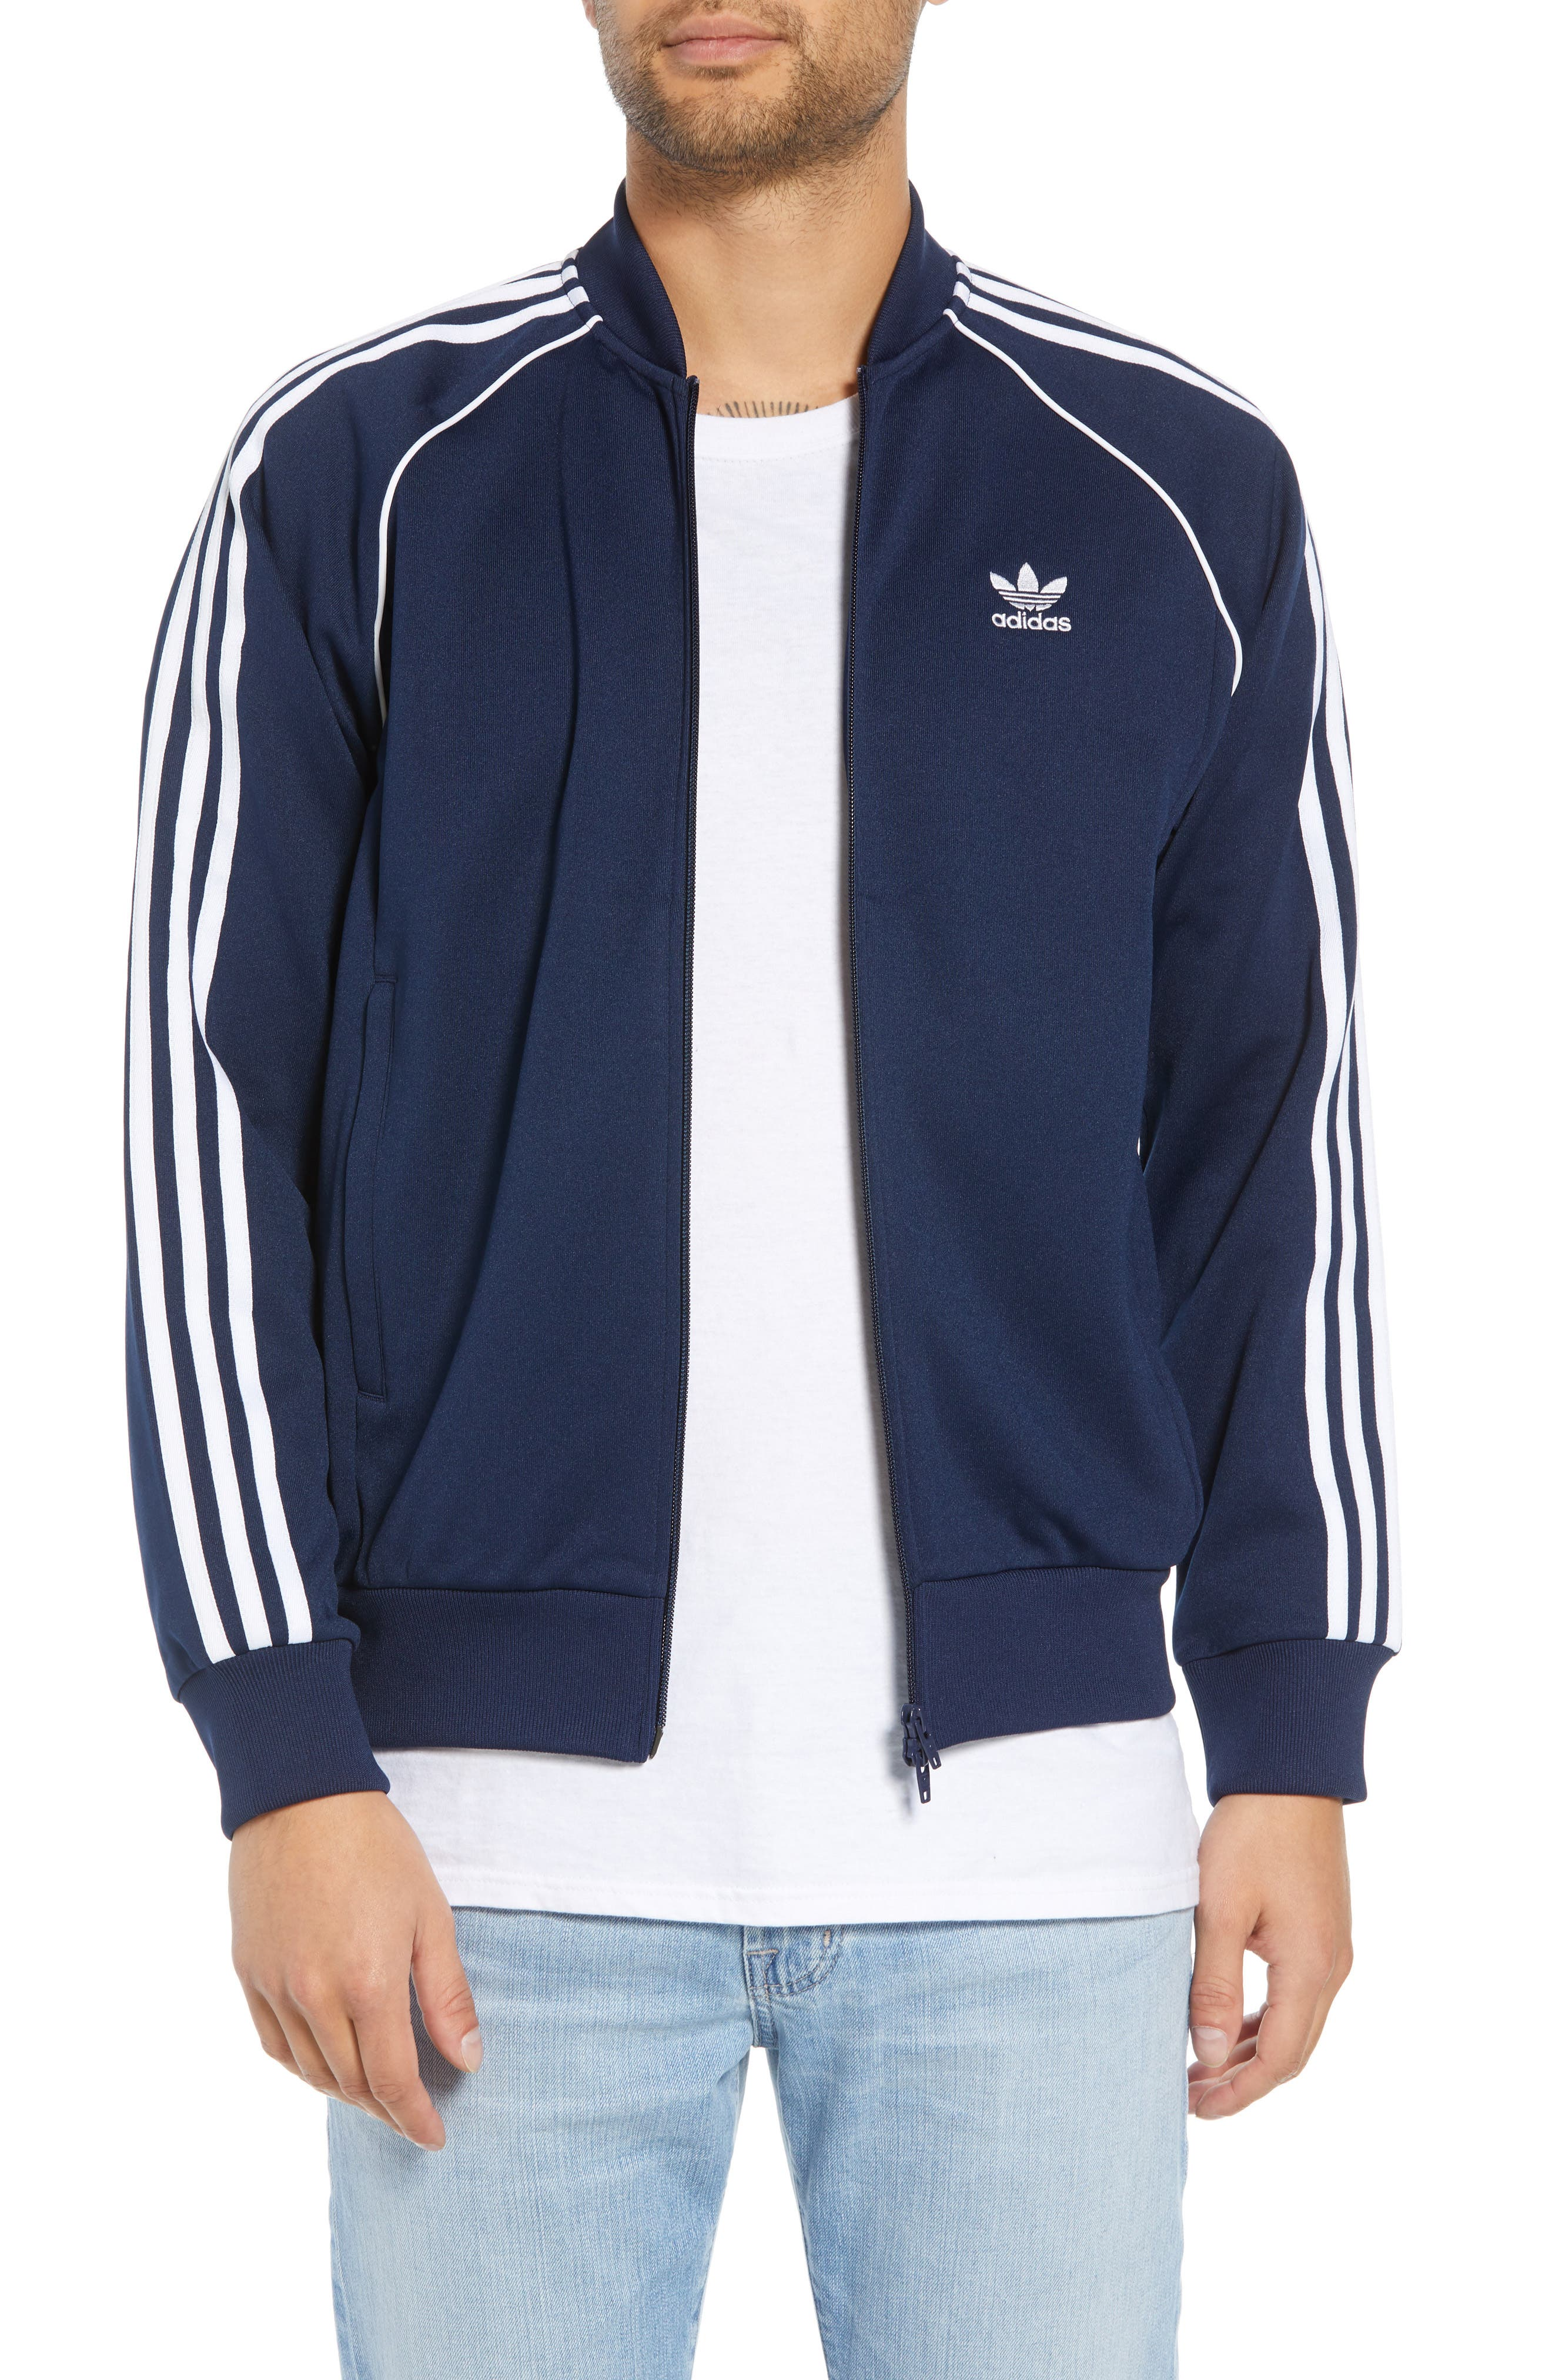 adidas sst jacket Shop Clothing & Shoes Online